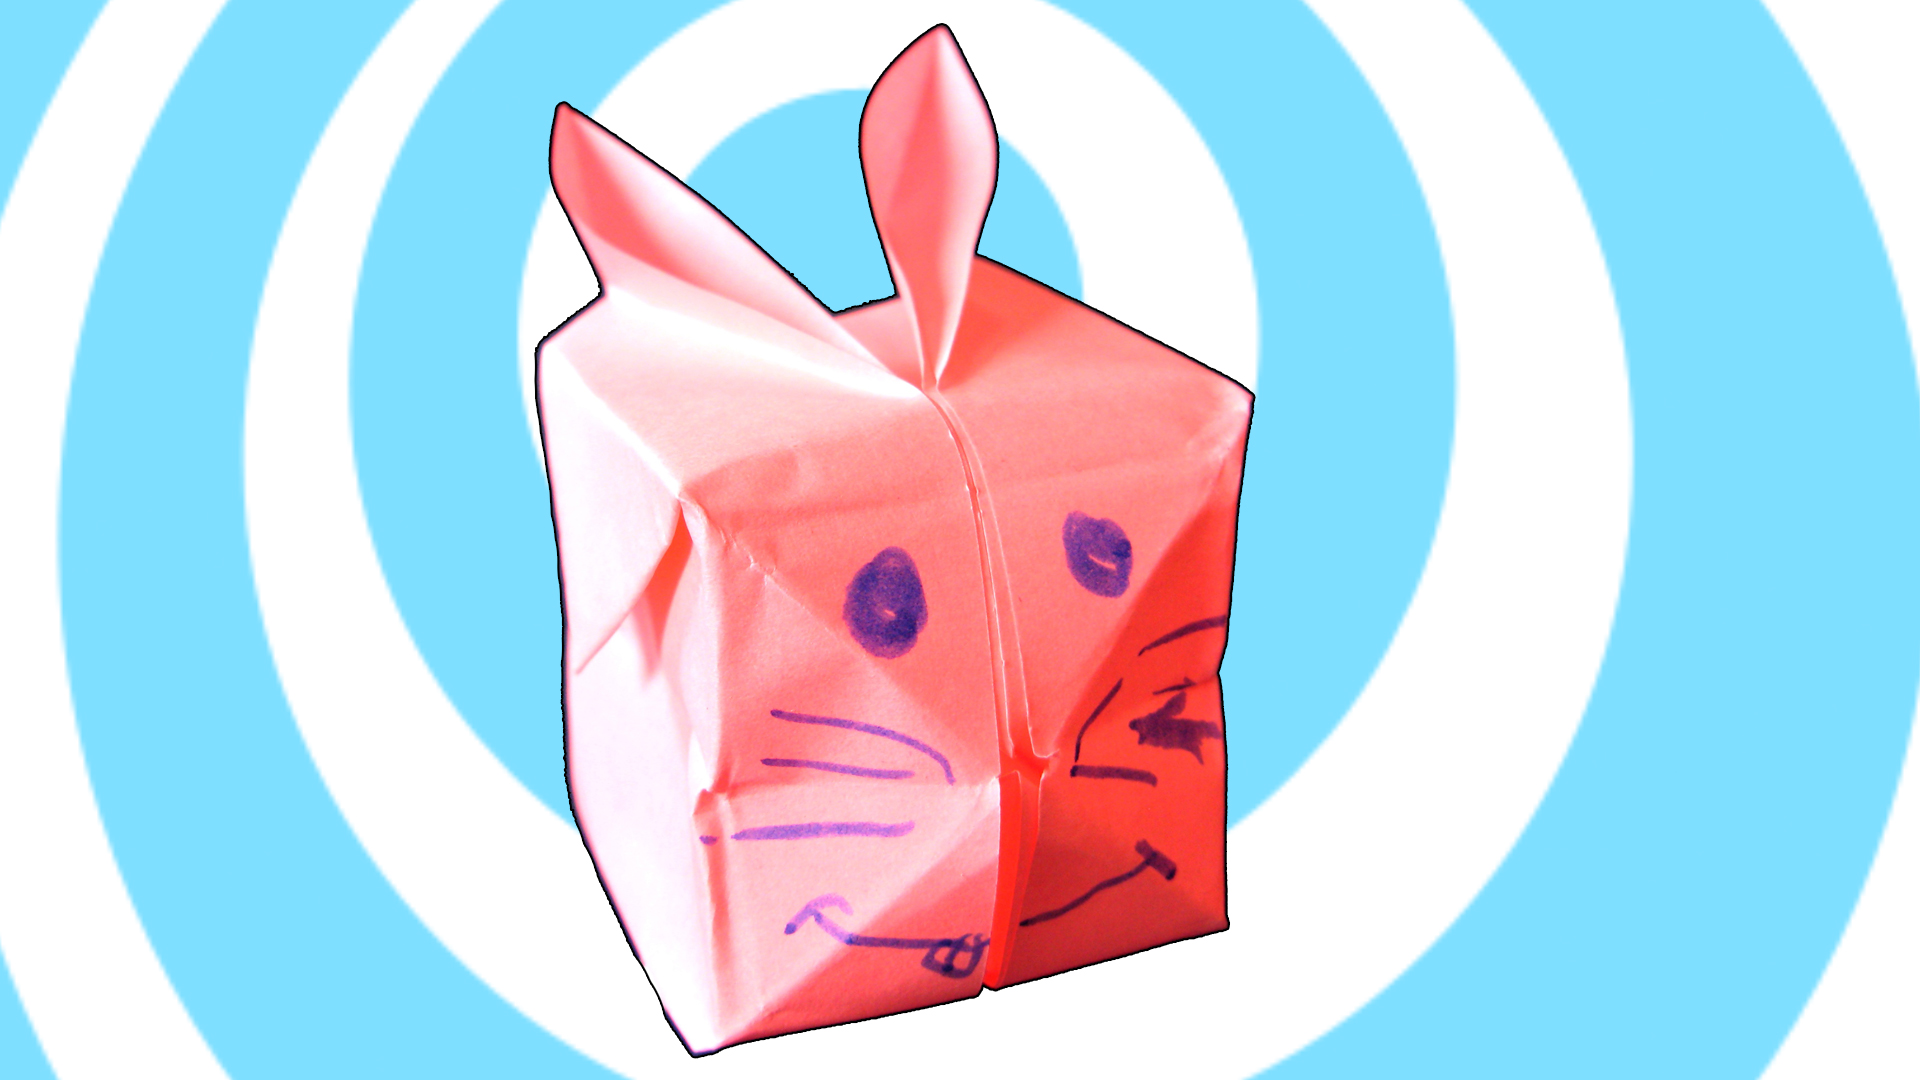 Origami Balloon Rabbit / Bunny